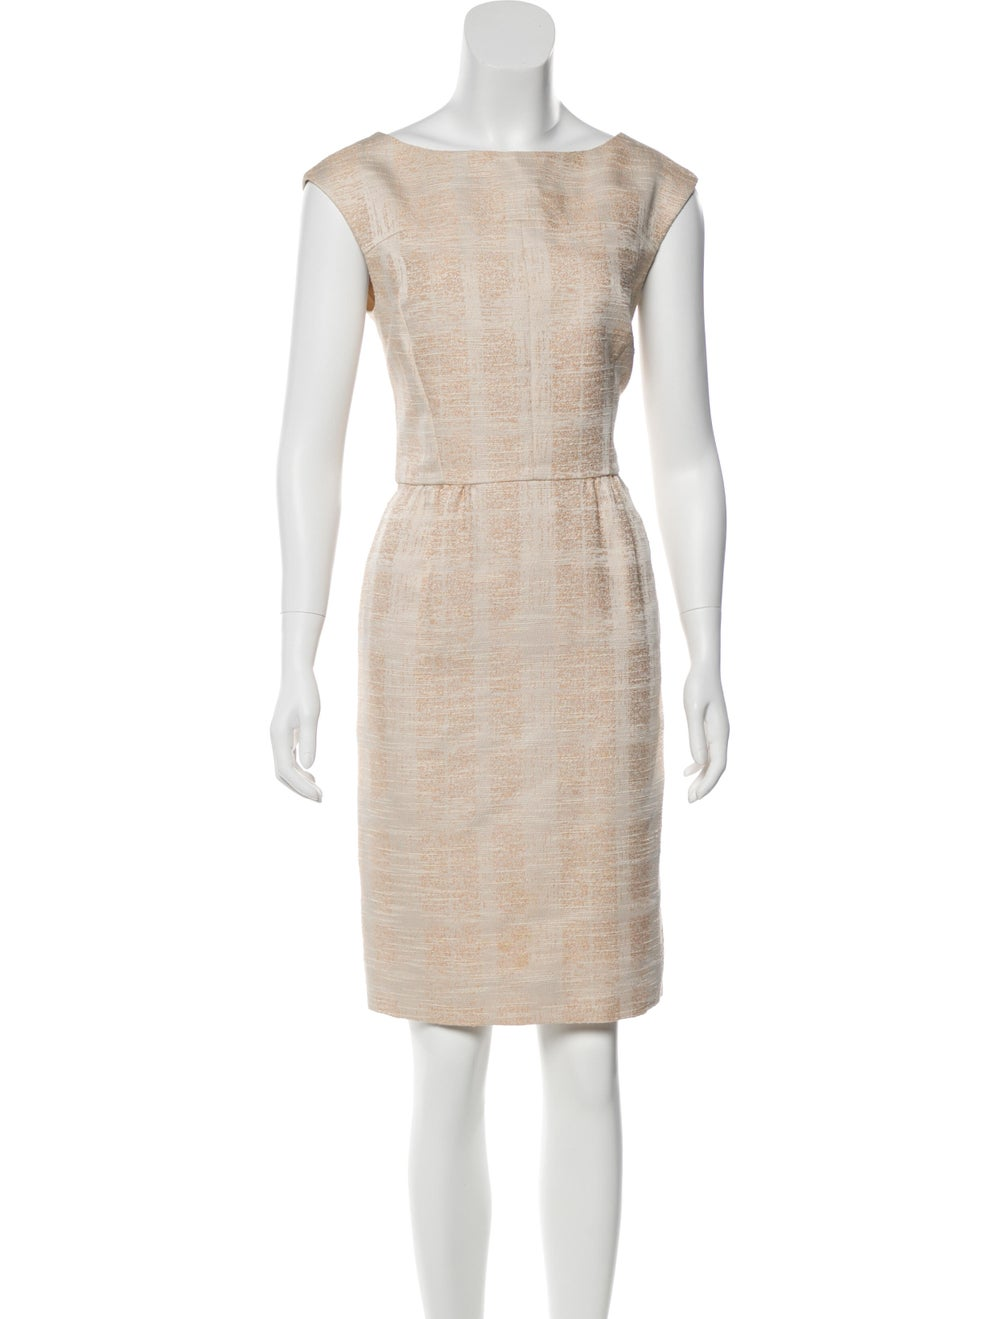 Tory Burch Tweed Pattern Dress Set - image 4